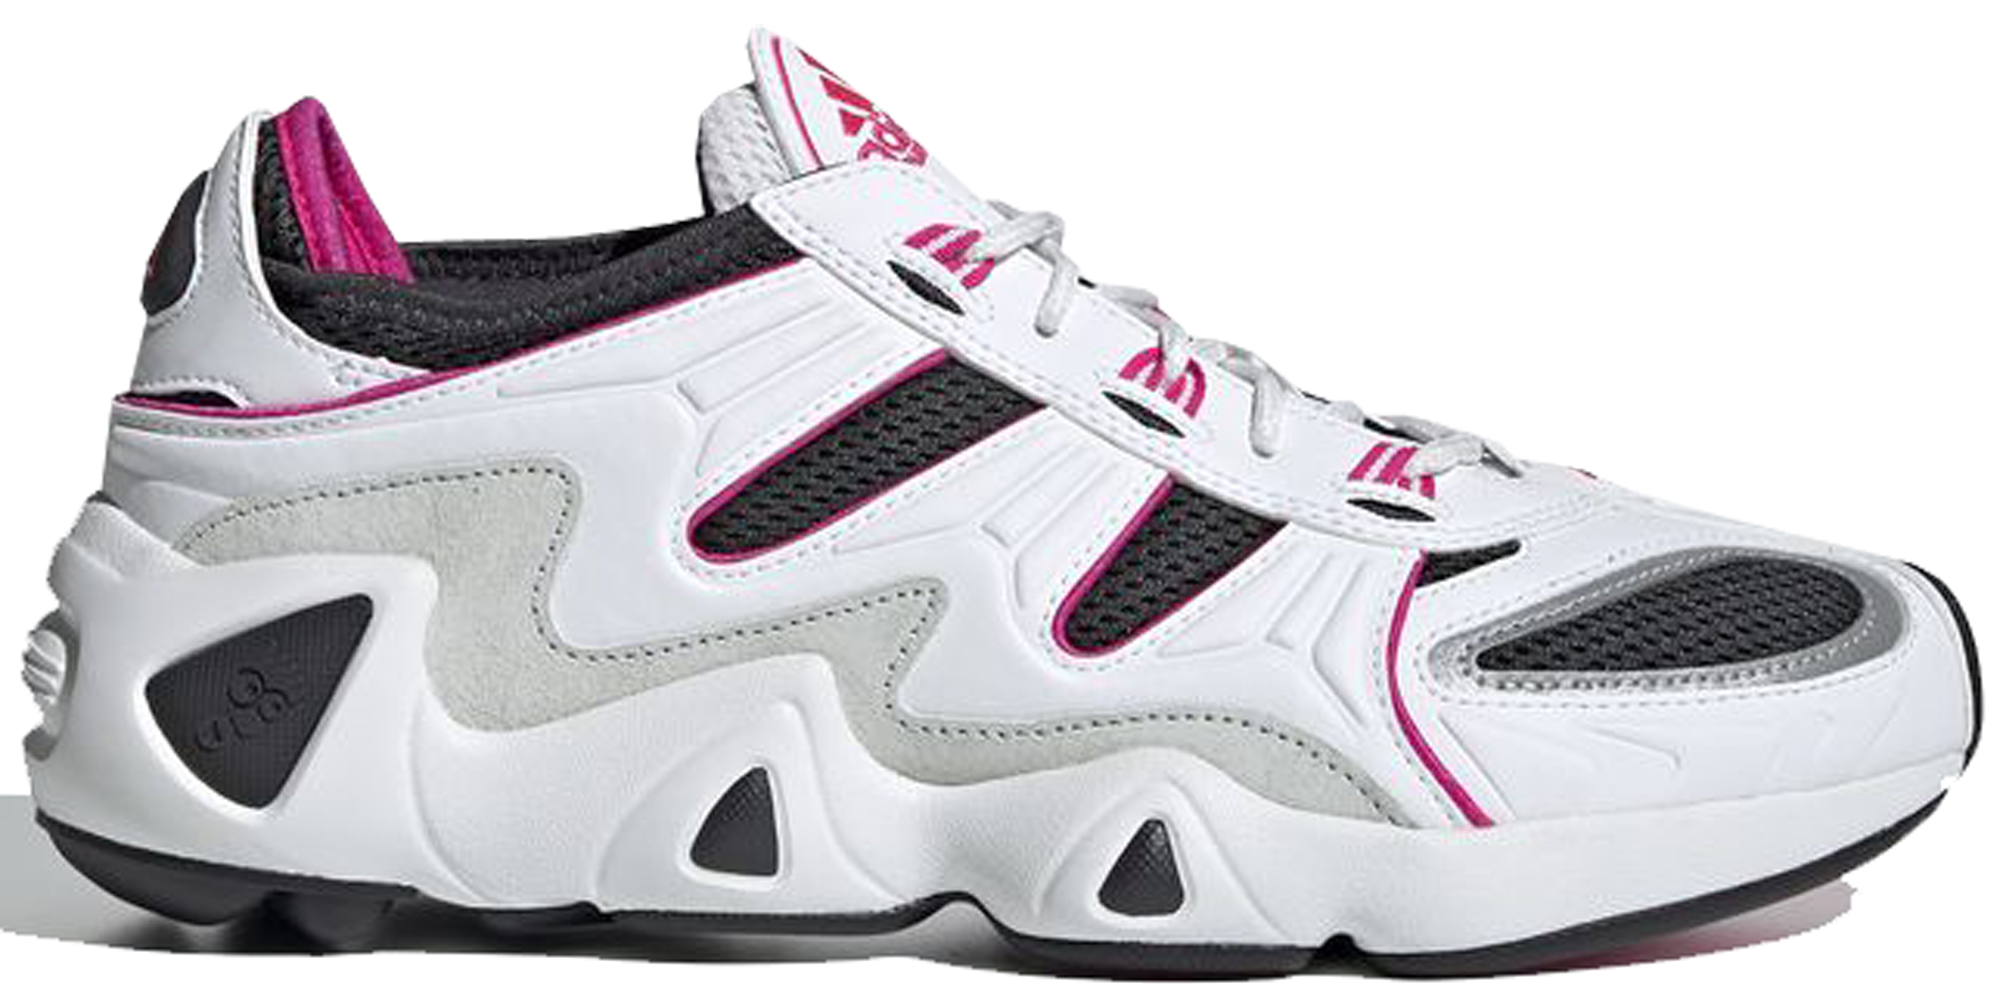 adidas FYW S-97 Crystal White Shock Pink